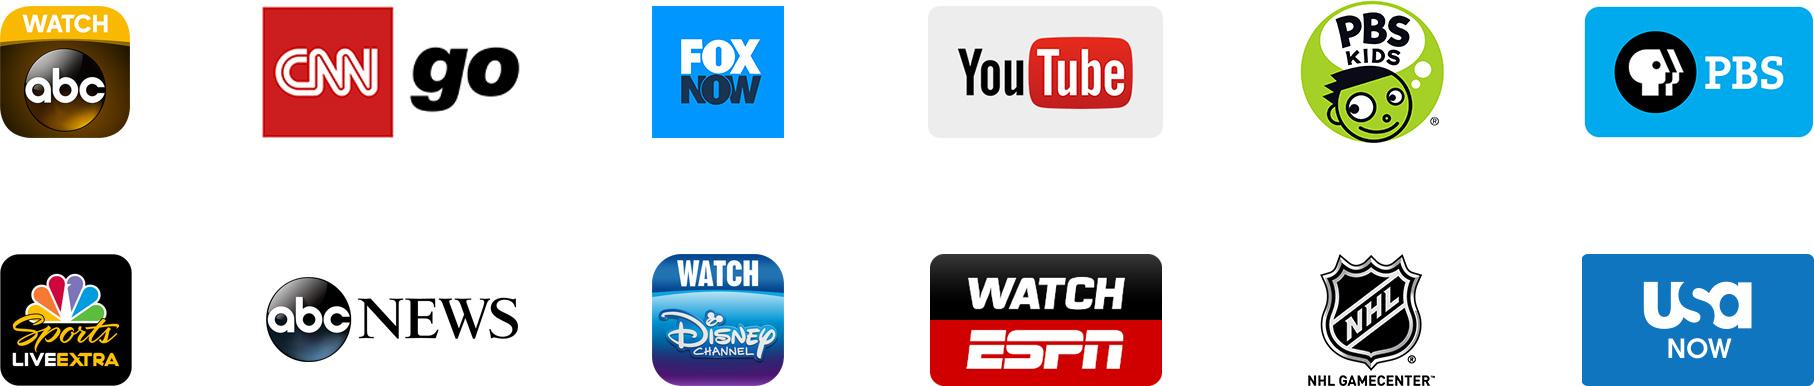 Channels on Apple TV